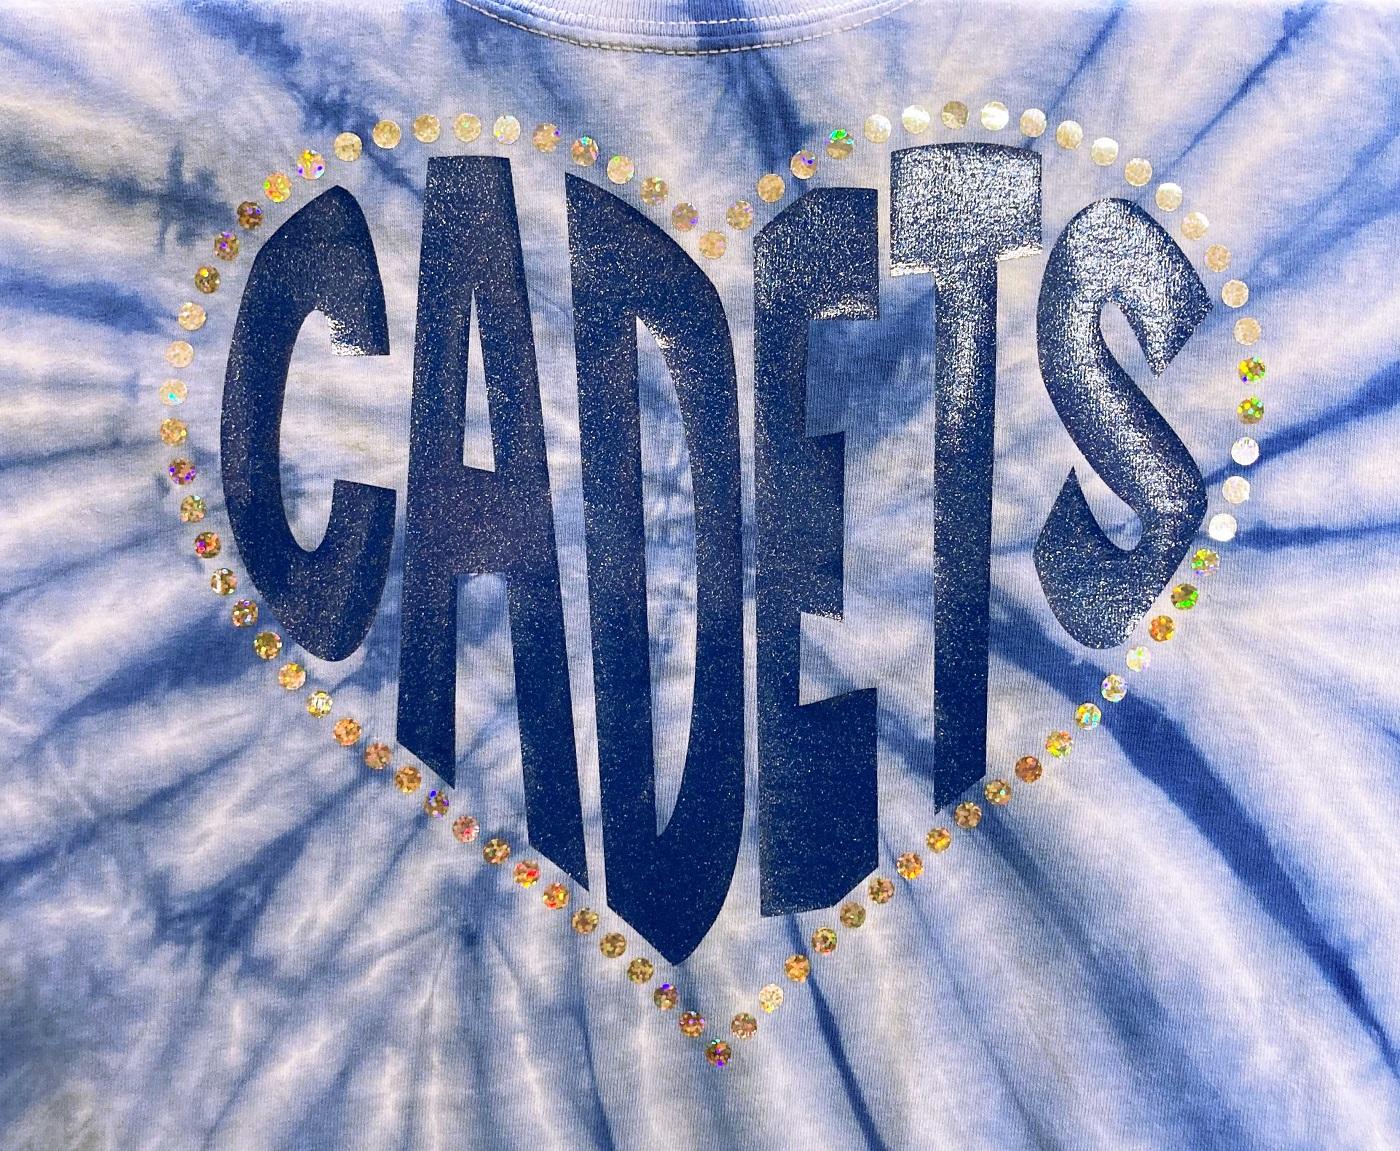 CadetsTieDye